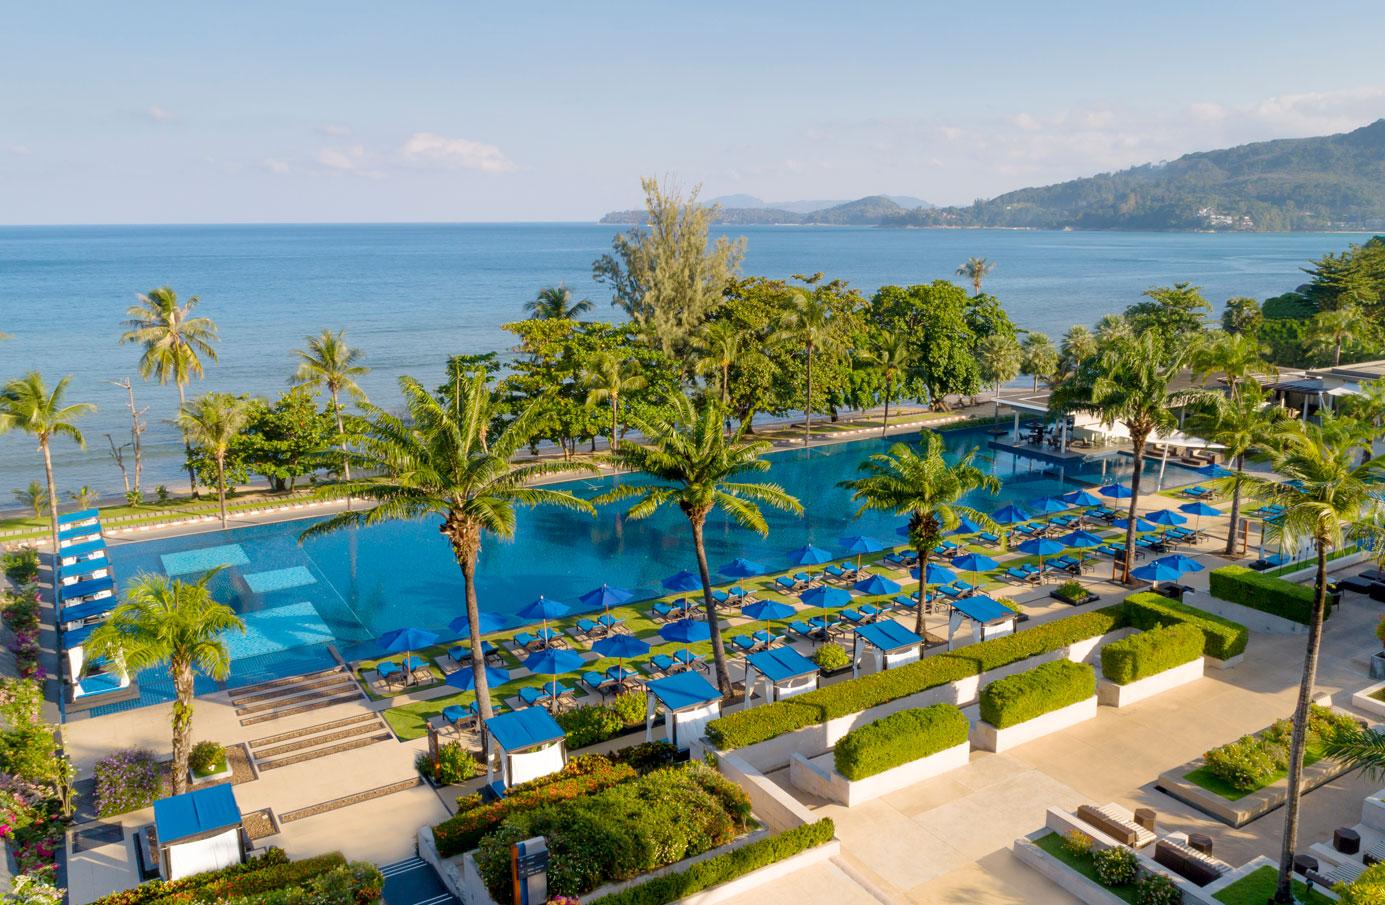 001—Hyatt-Regency-Phuket-Resort—Aerial-Shot